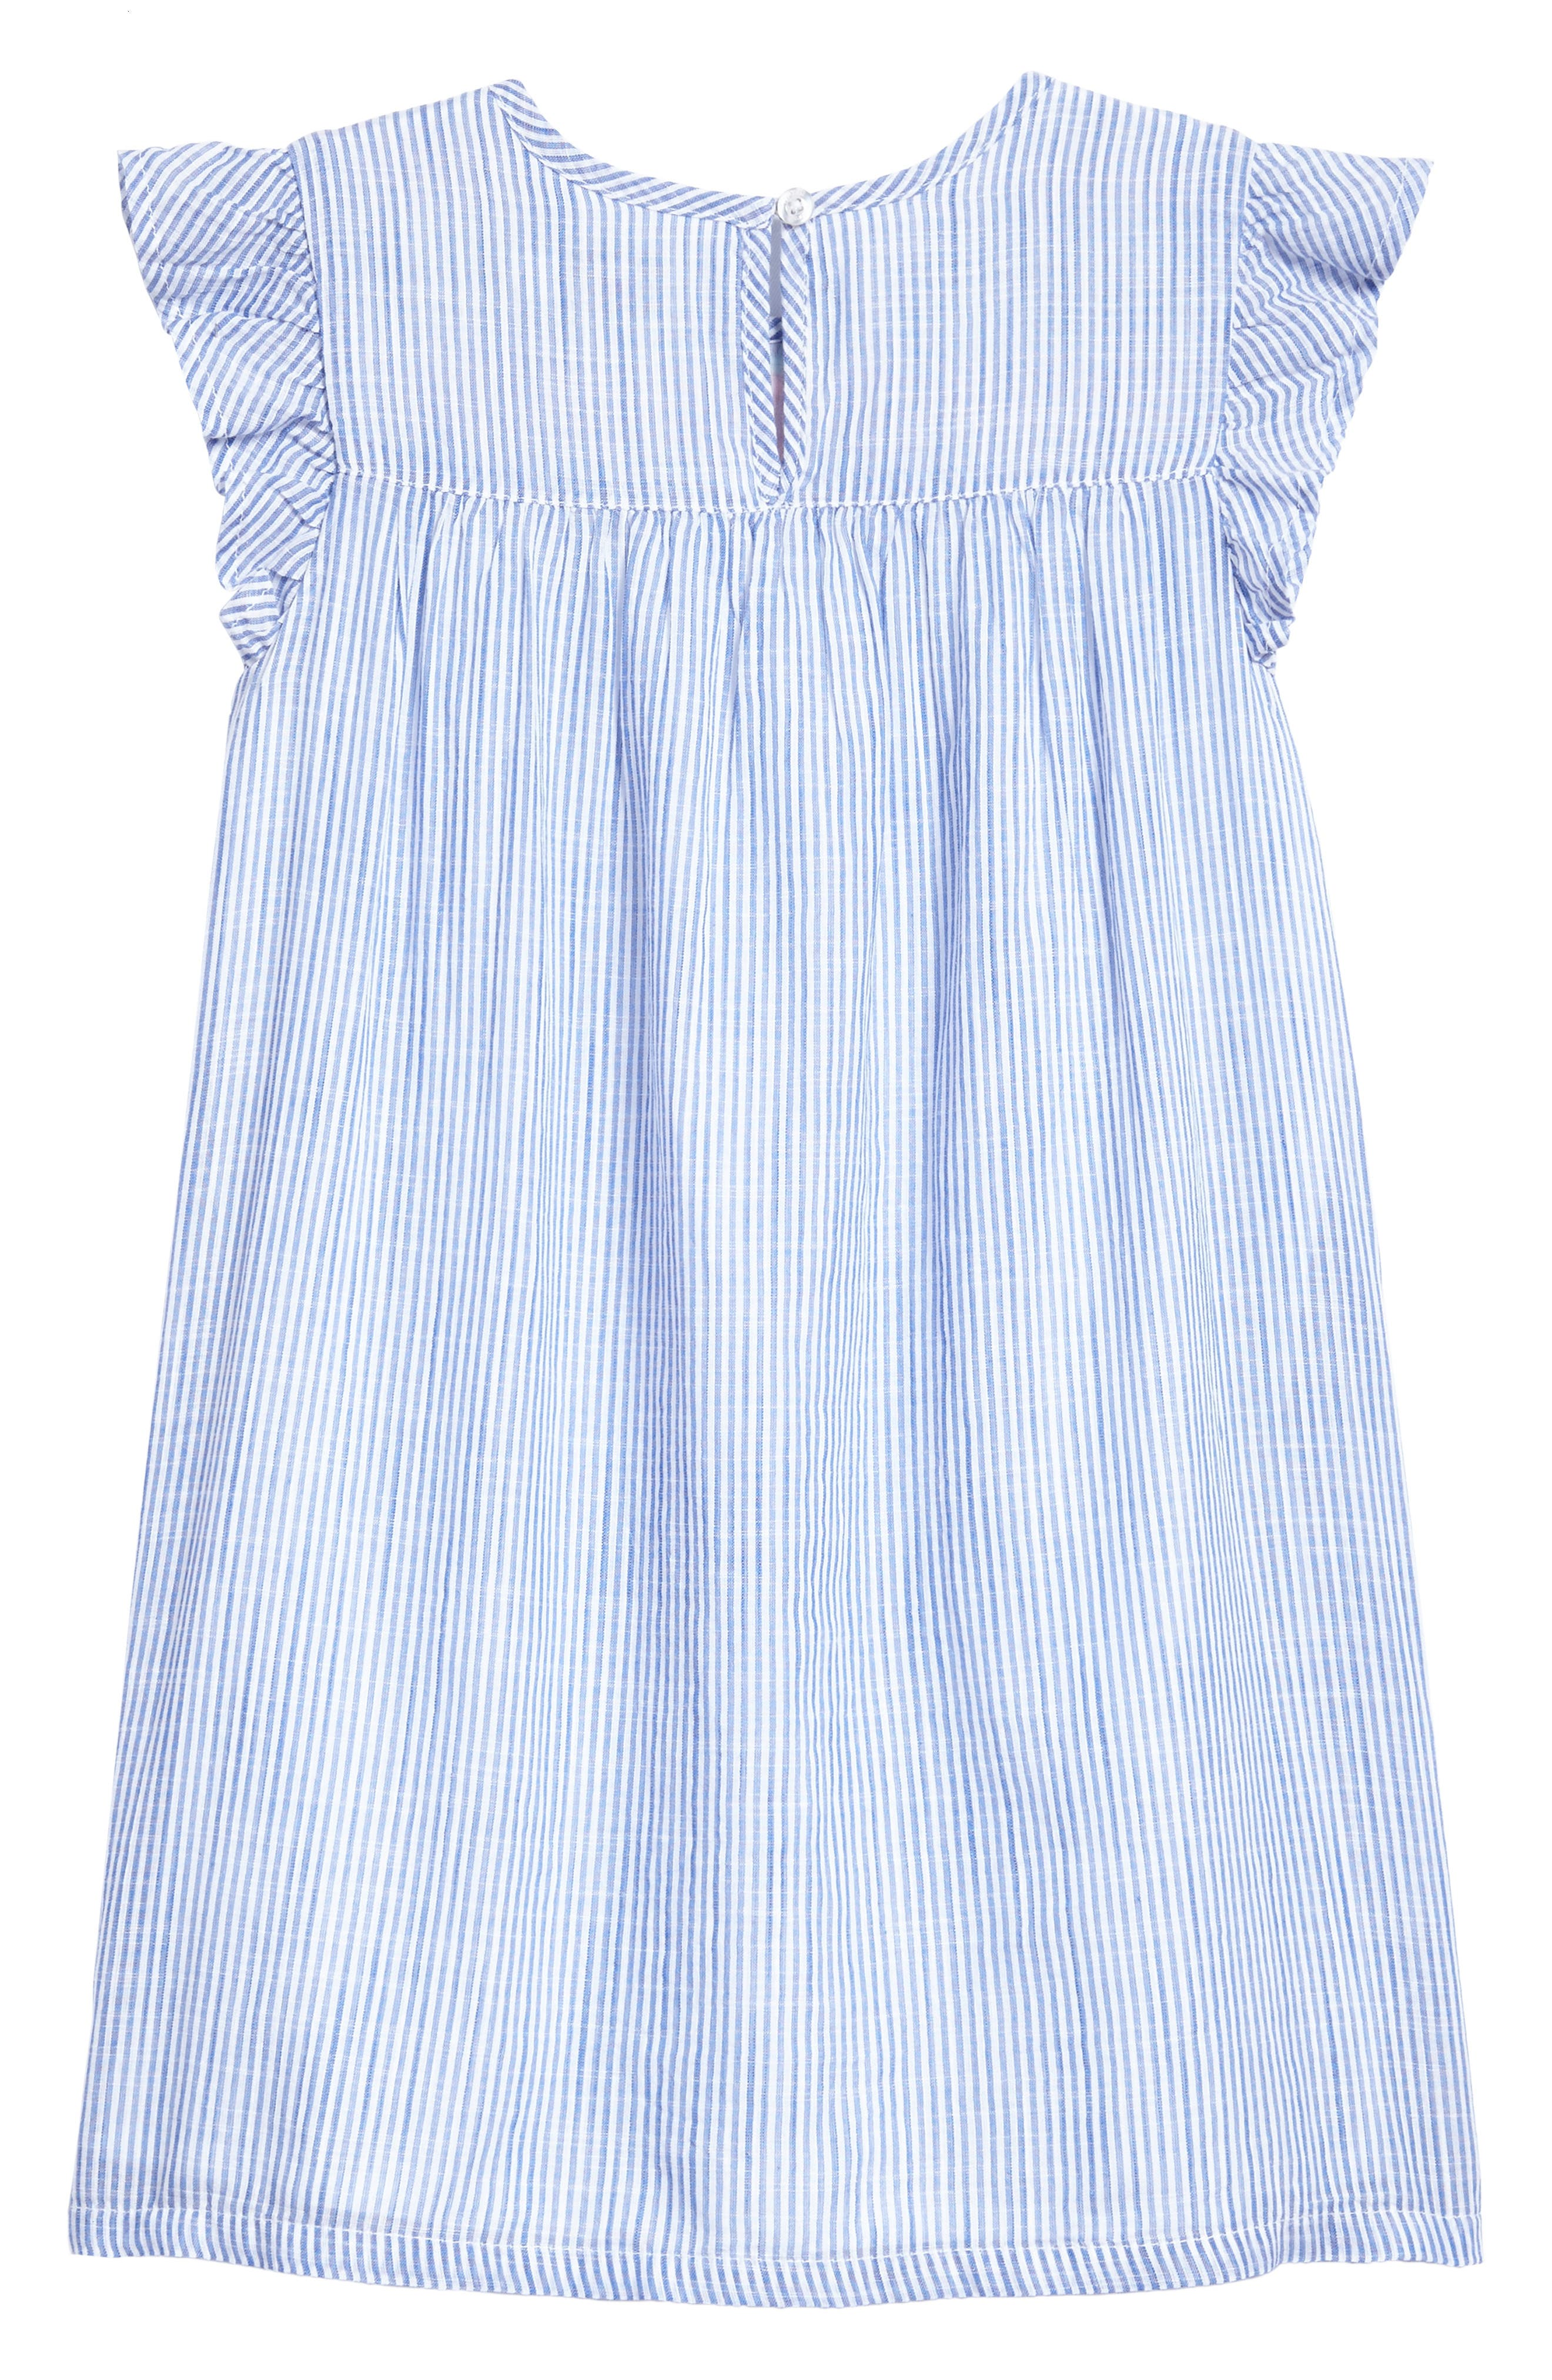 Embroidered Flutter Dress,                             Alternate thumbnail 2, color,                             White Cap